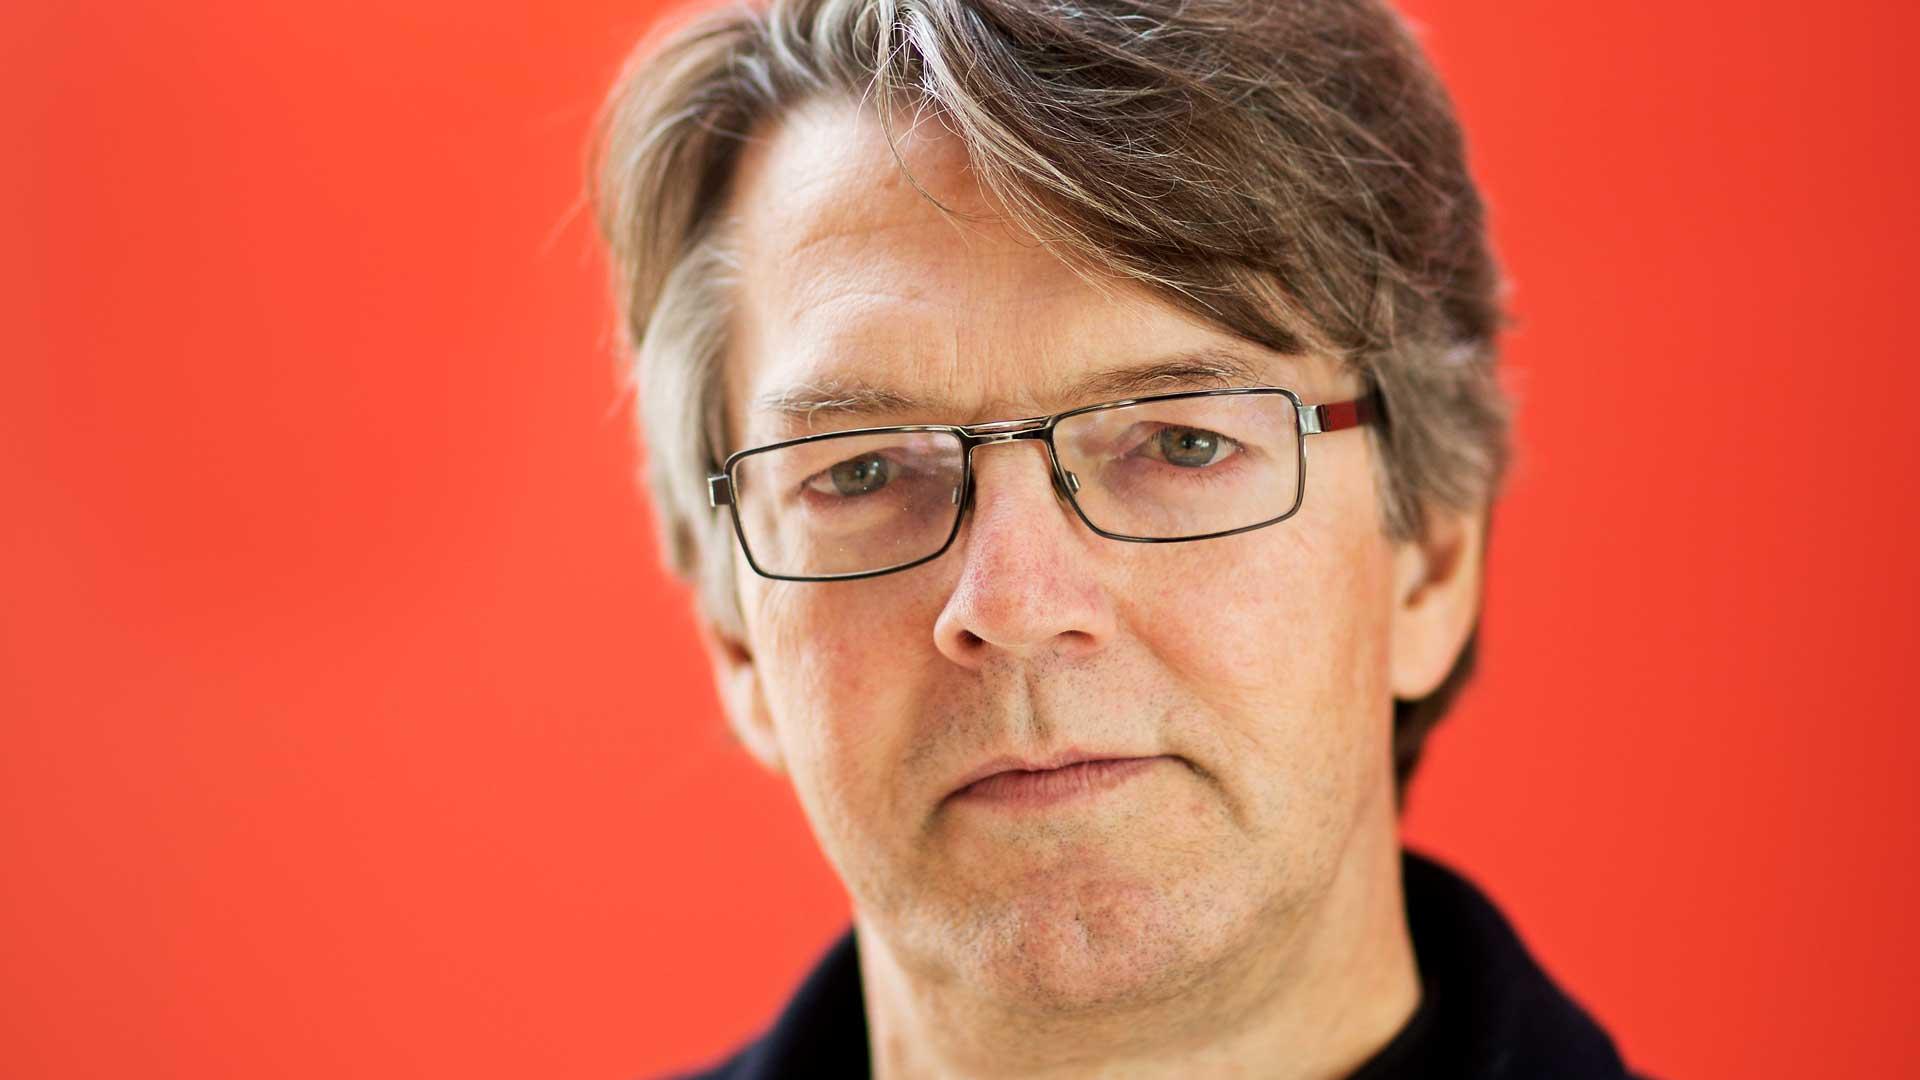 Anders Hultqvist, foto: Johan Wingborg, Göteborgs universitet